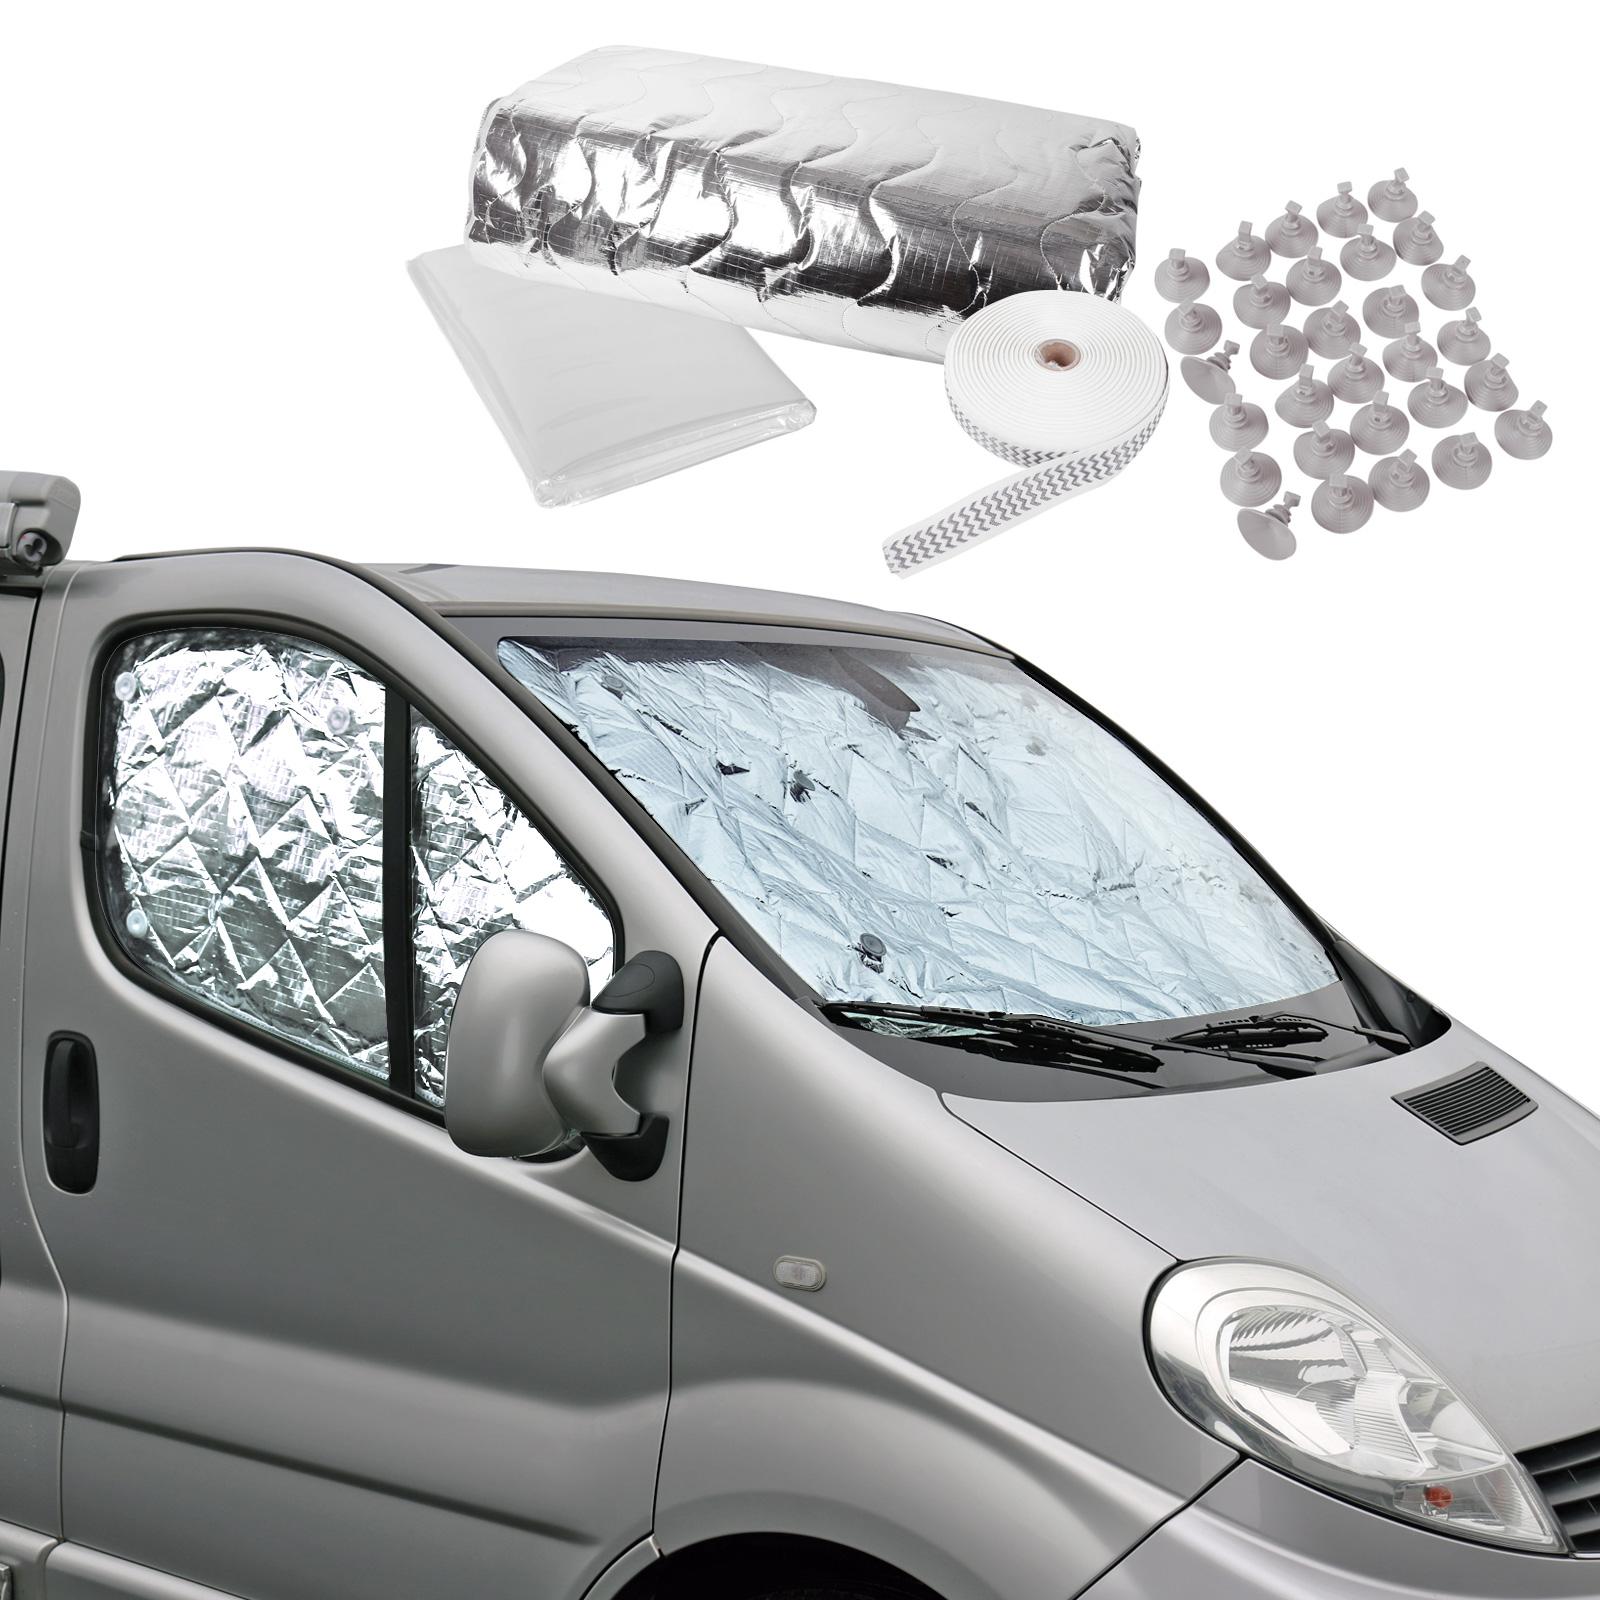 deiwo® Thermomatte Fahrerhaus Do-it-yourself Kit für alle Modelle DIY